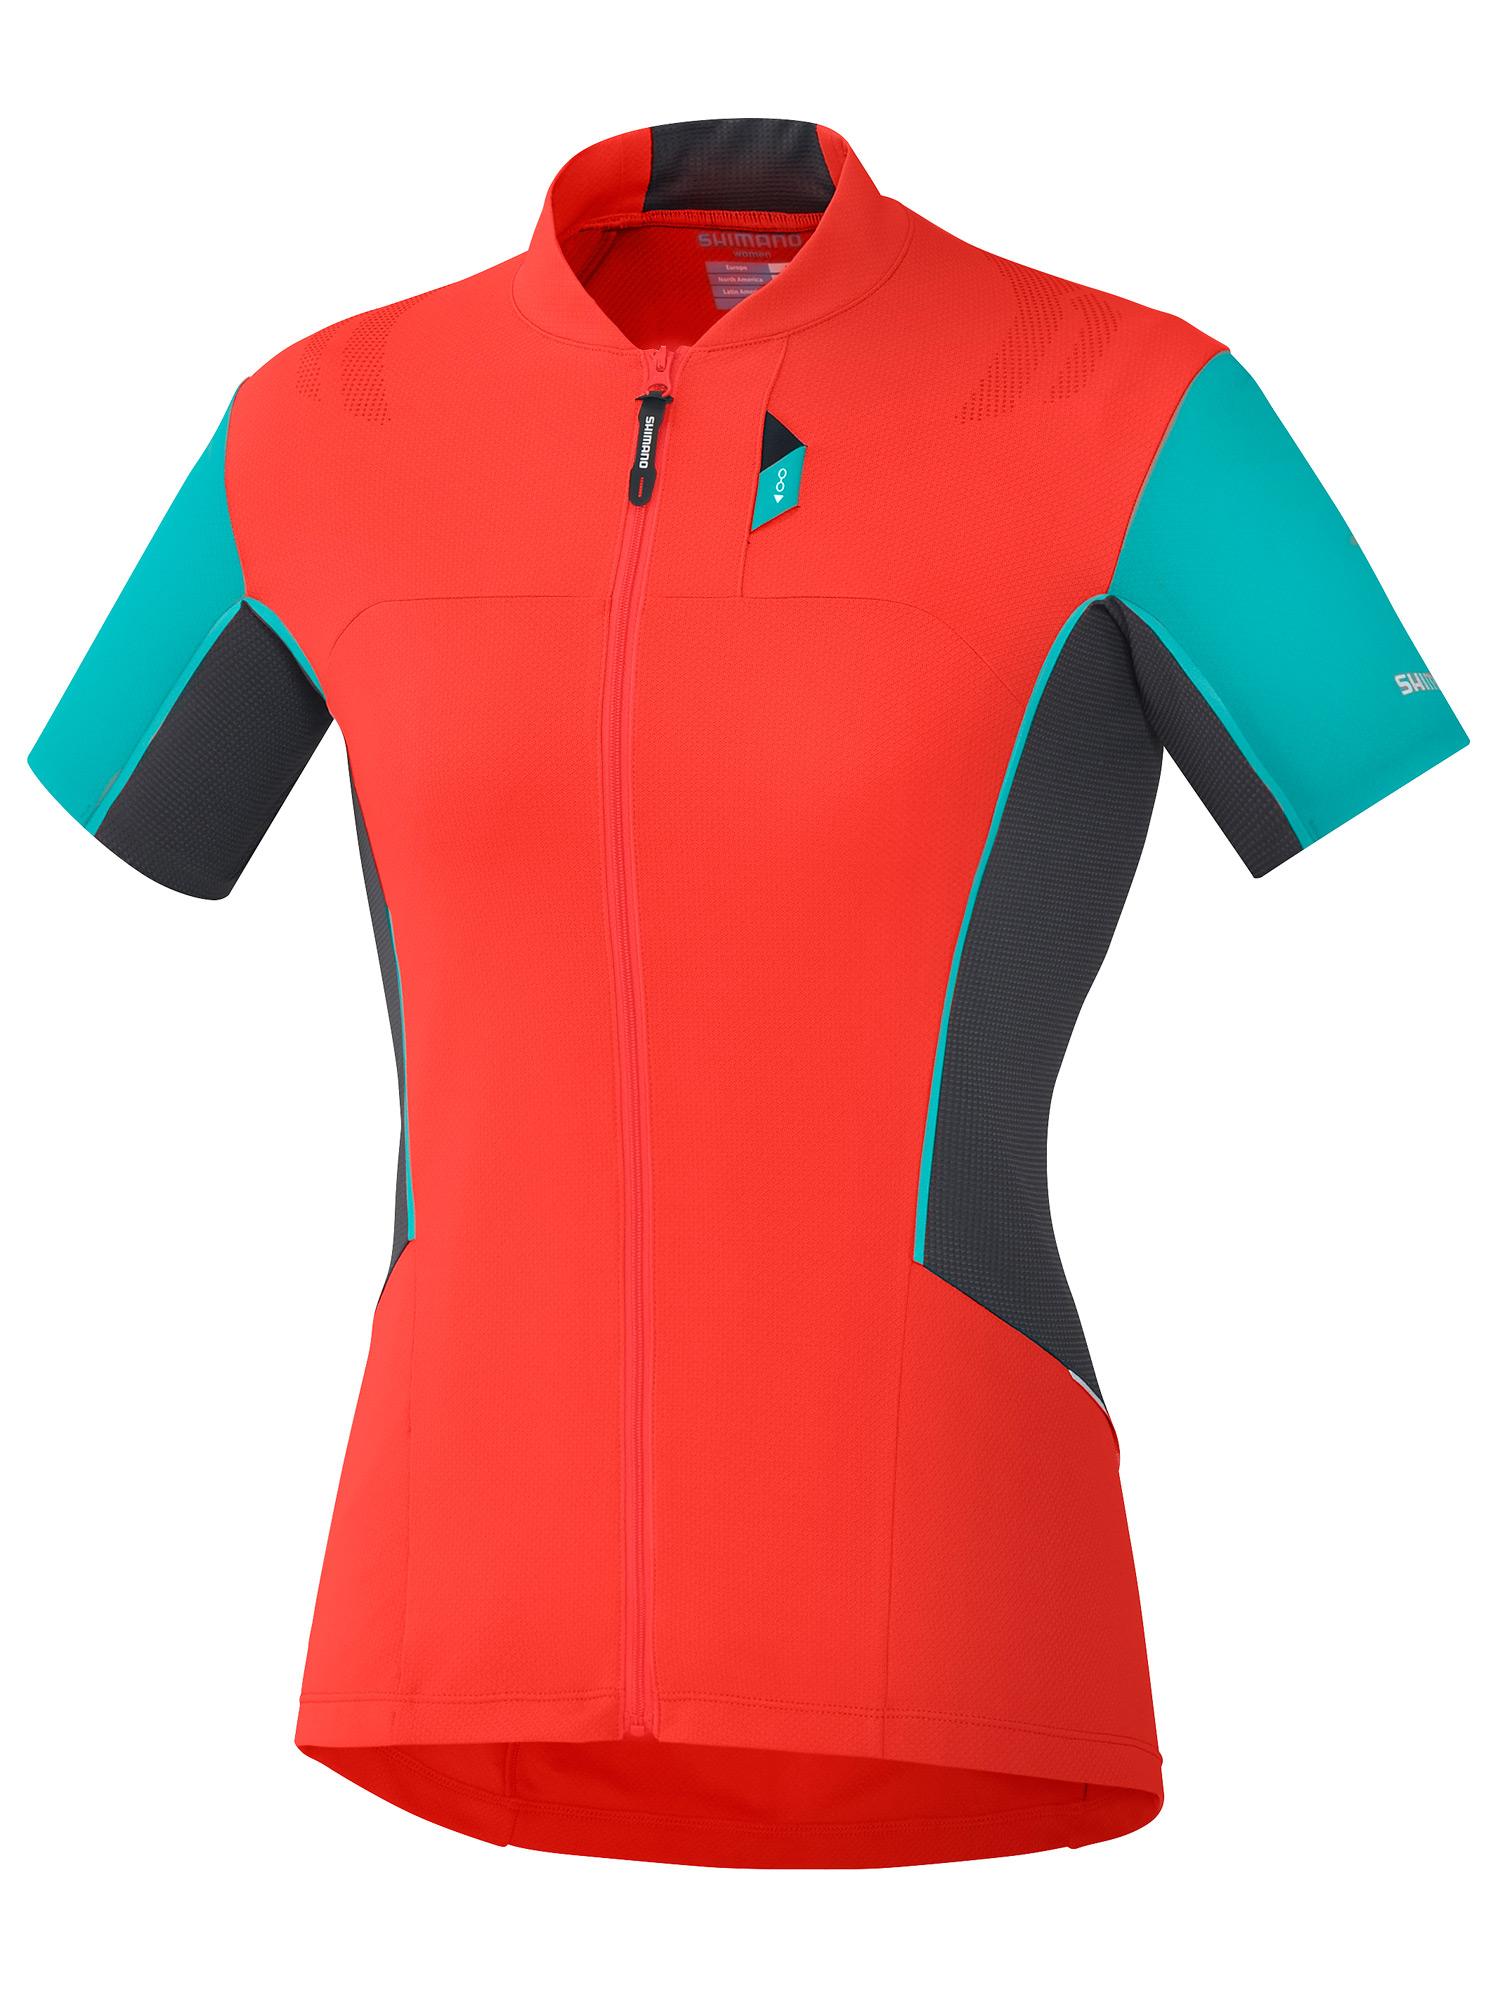 ...  Shimano Explorer-Transit clothing-urban-touring-riding-gear Transit-trail-jersey-  ... 7a14c55e0